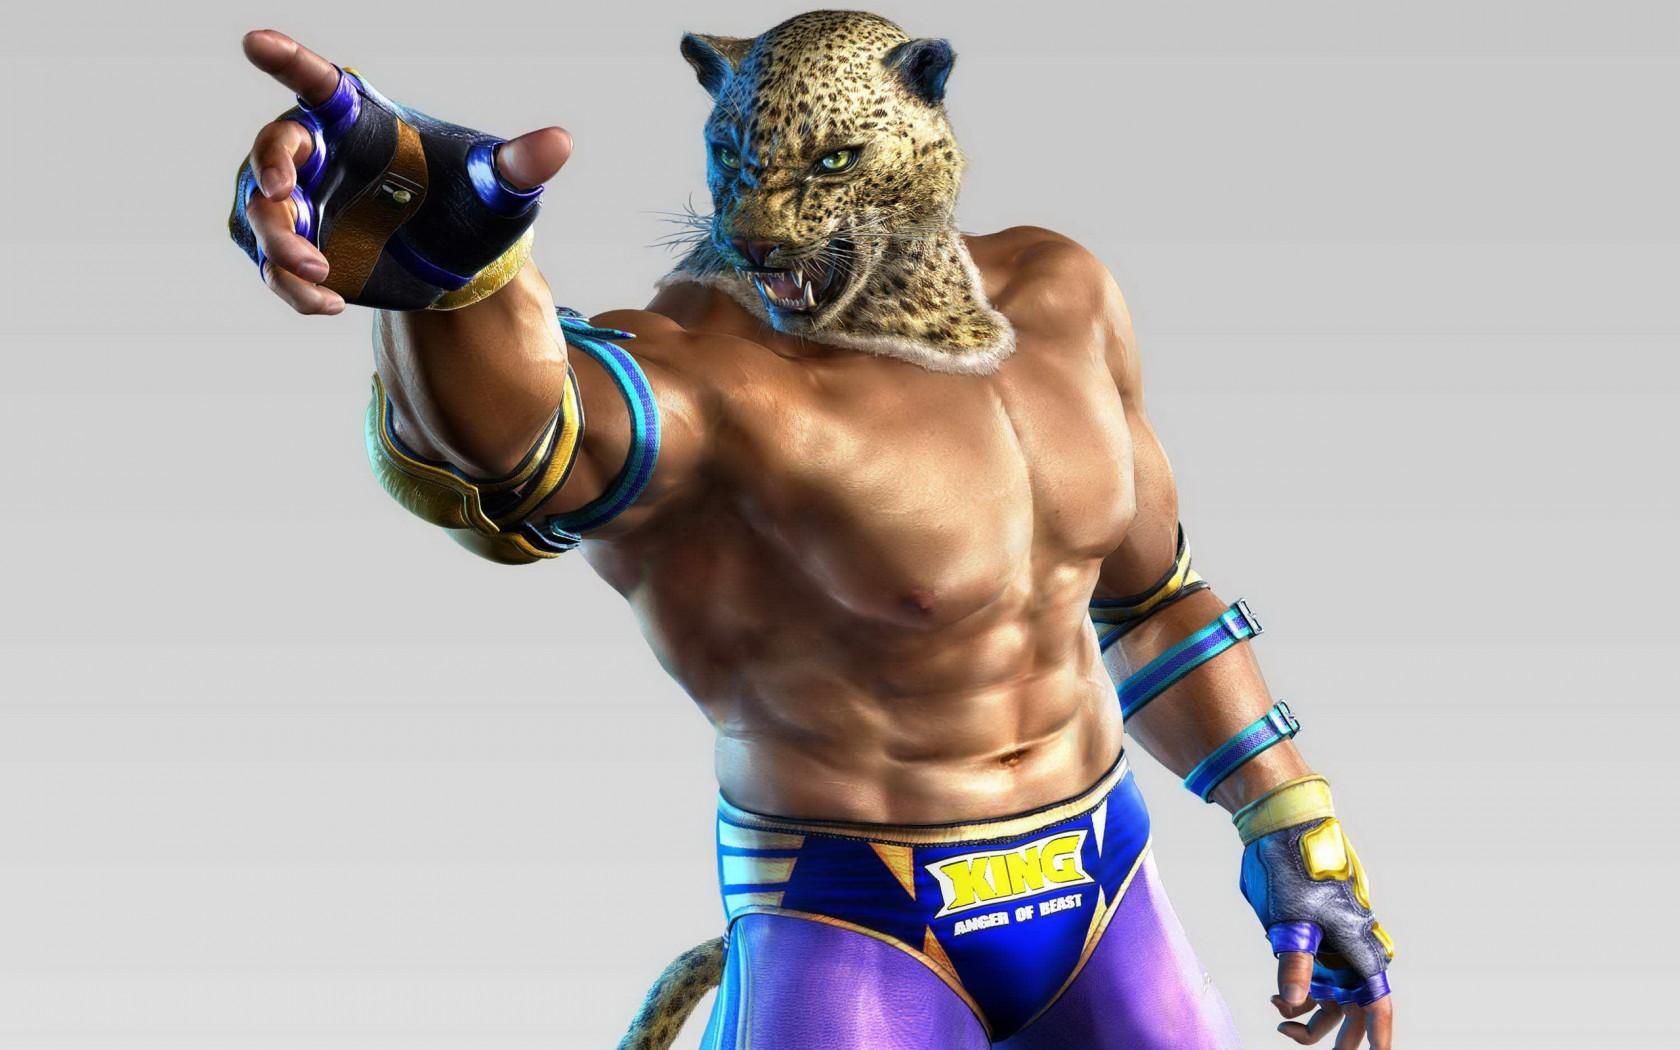 Hd Tiger Wallpapers For Iphone 5 King Tekken Wallpapers Hd Wallpapers Id 9027